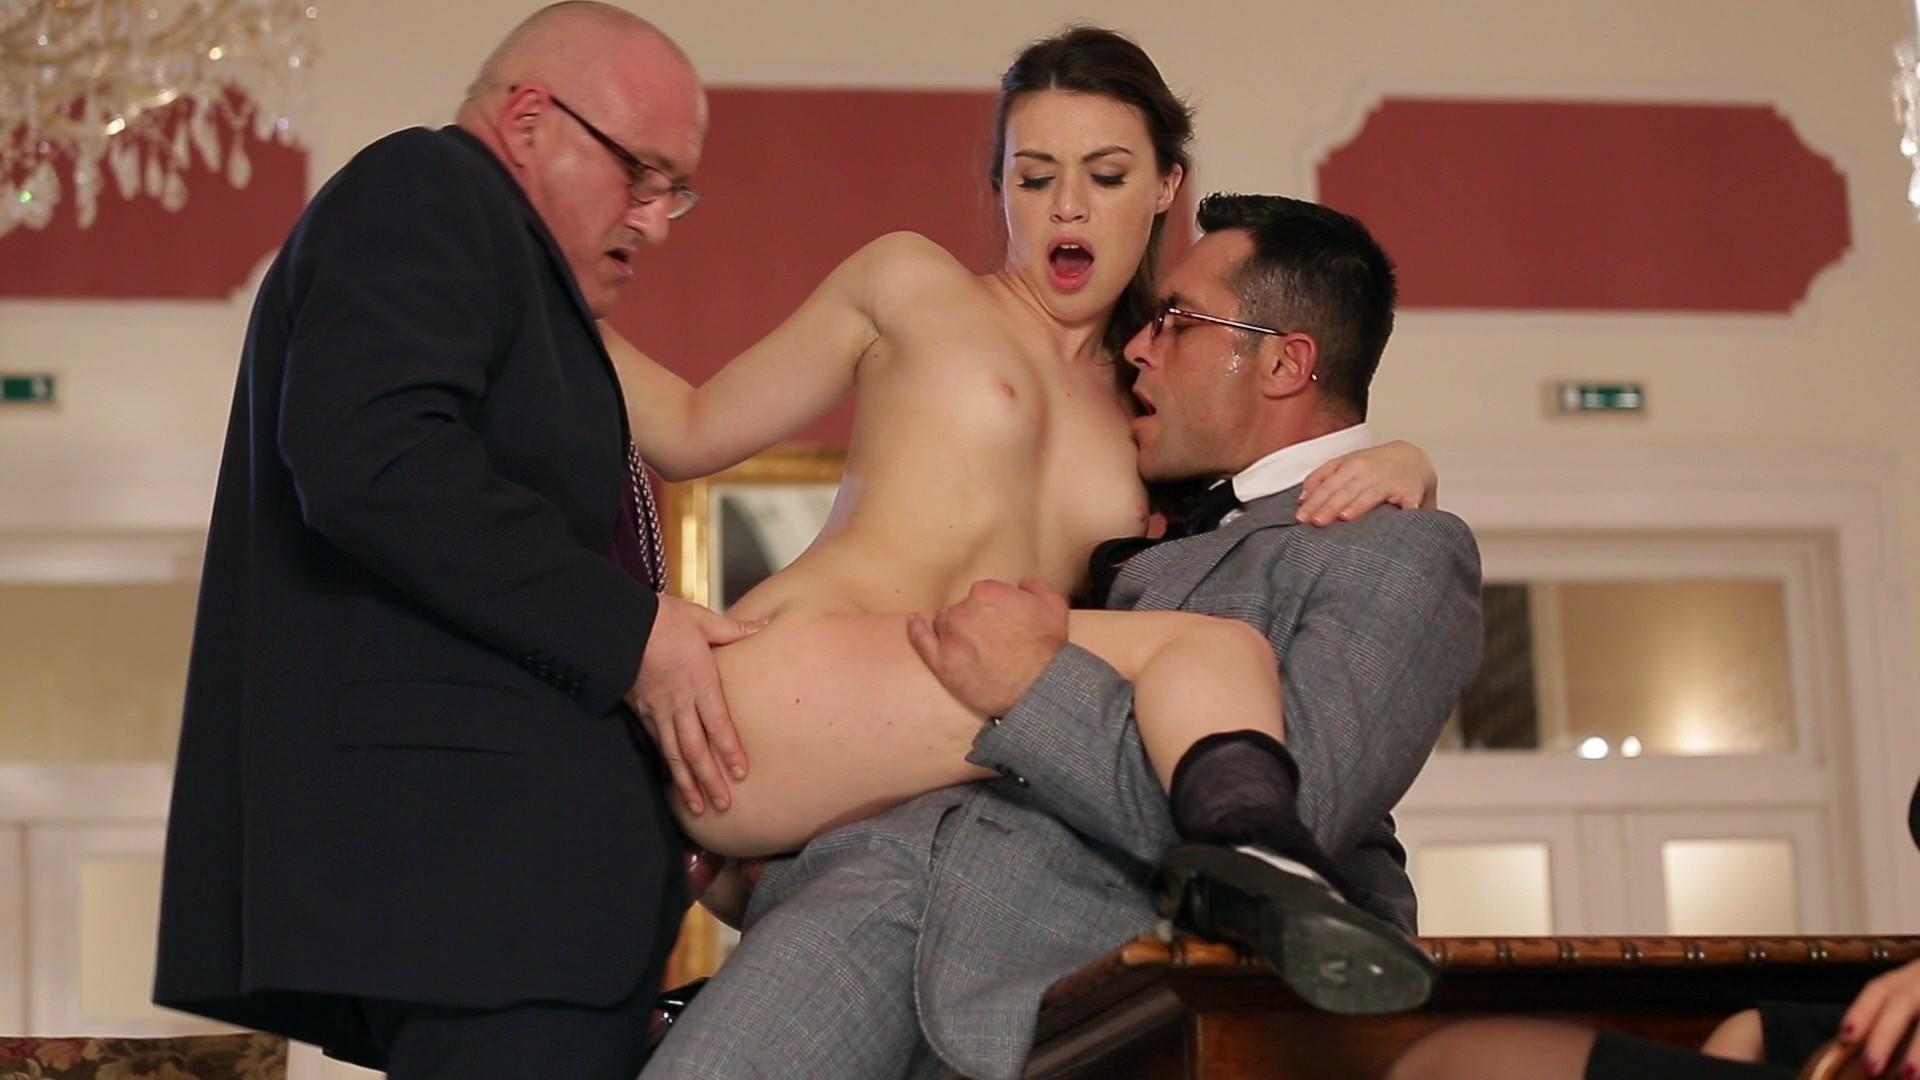 Порно фильм hd марка дорселя